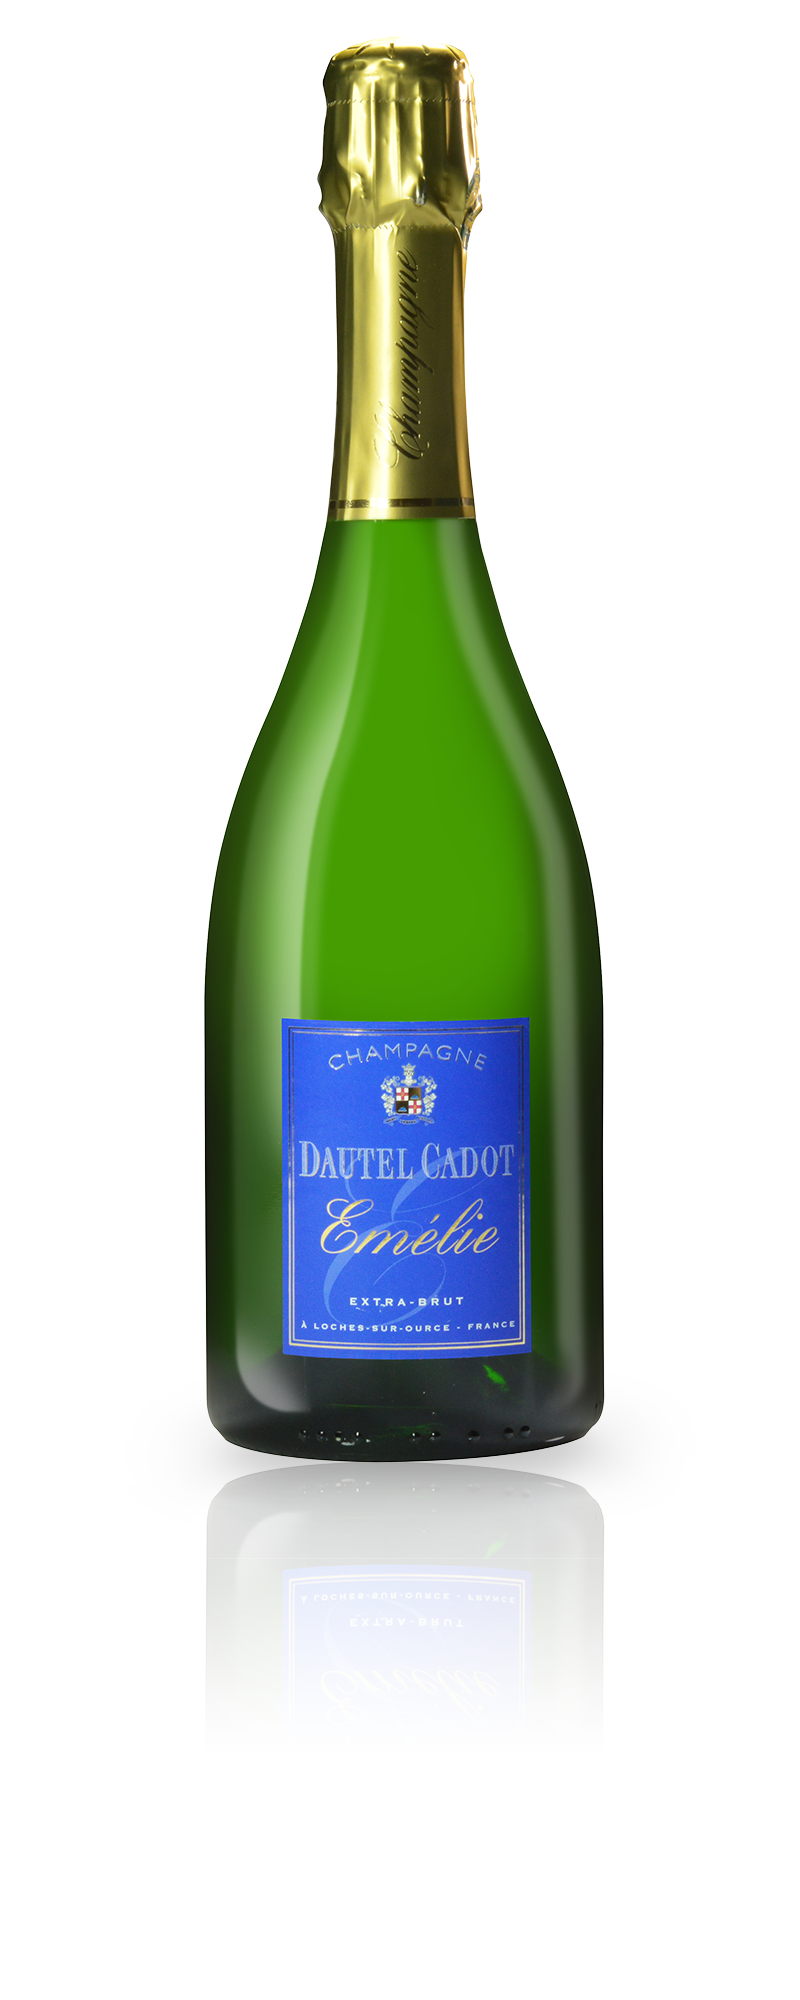 champagne-dautel-cadot-cuvee-emelie